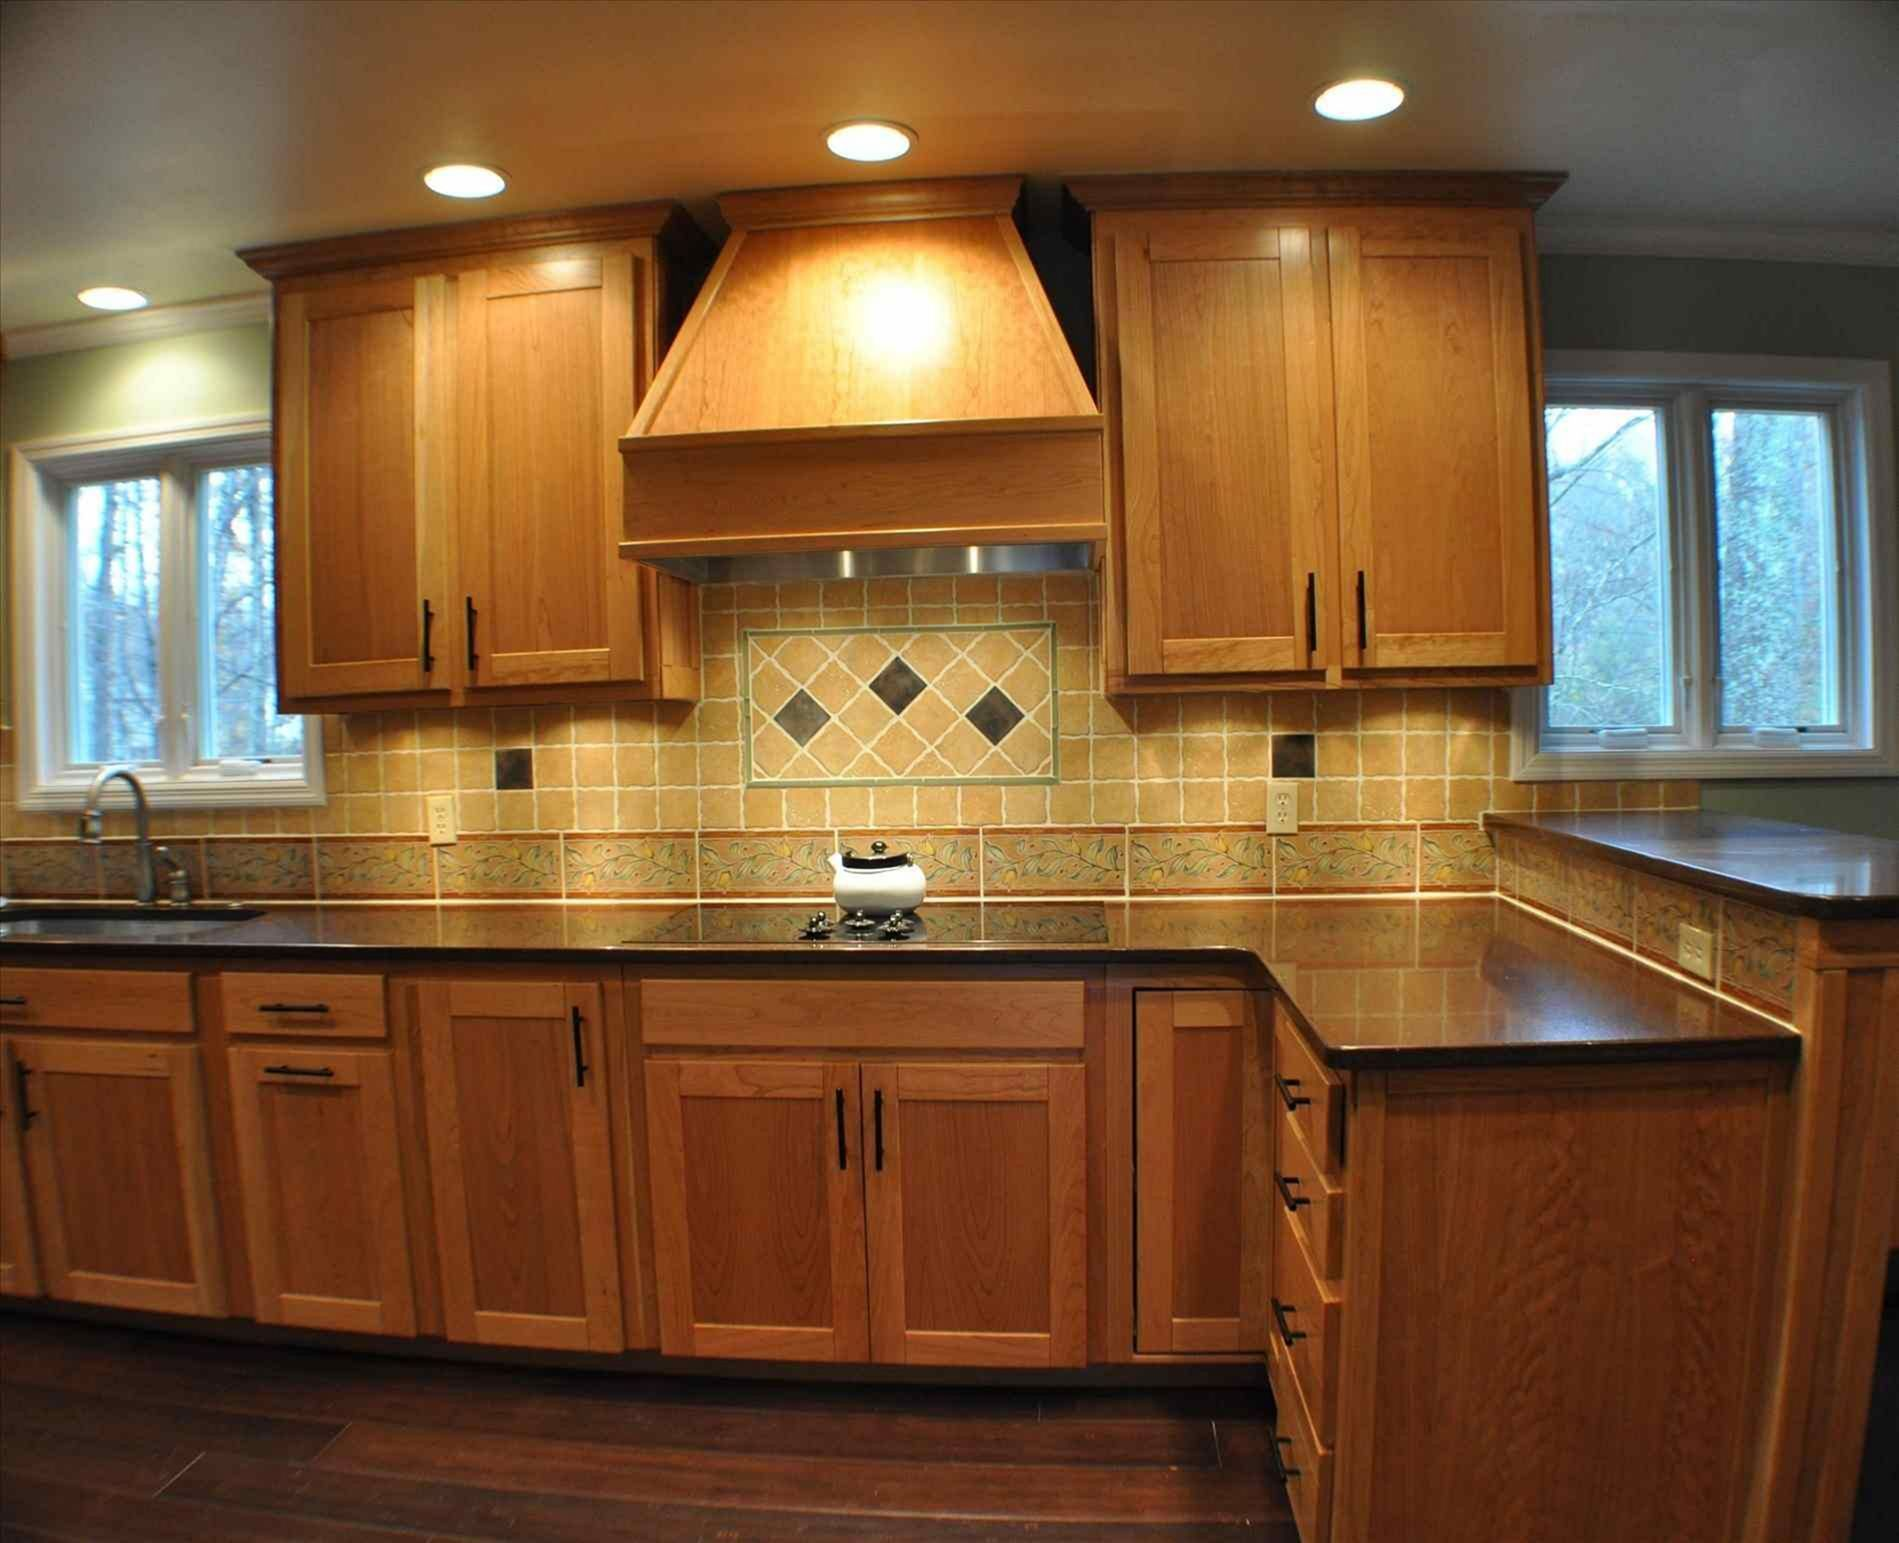 15 Gorgeous Light Cabinets Dark Countertops Design Ideas ... on Backsplash Ideas For Dark Cabinets And Light Countertops  id=63189